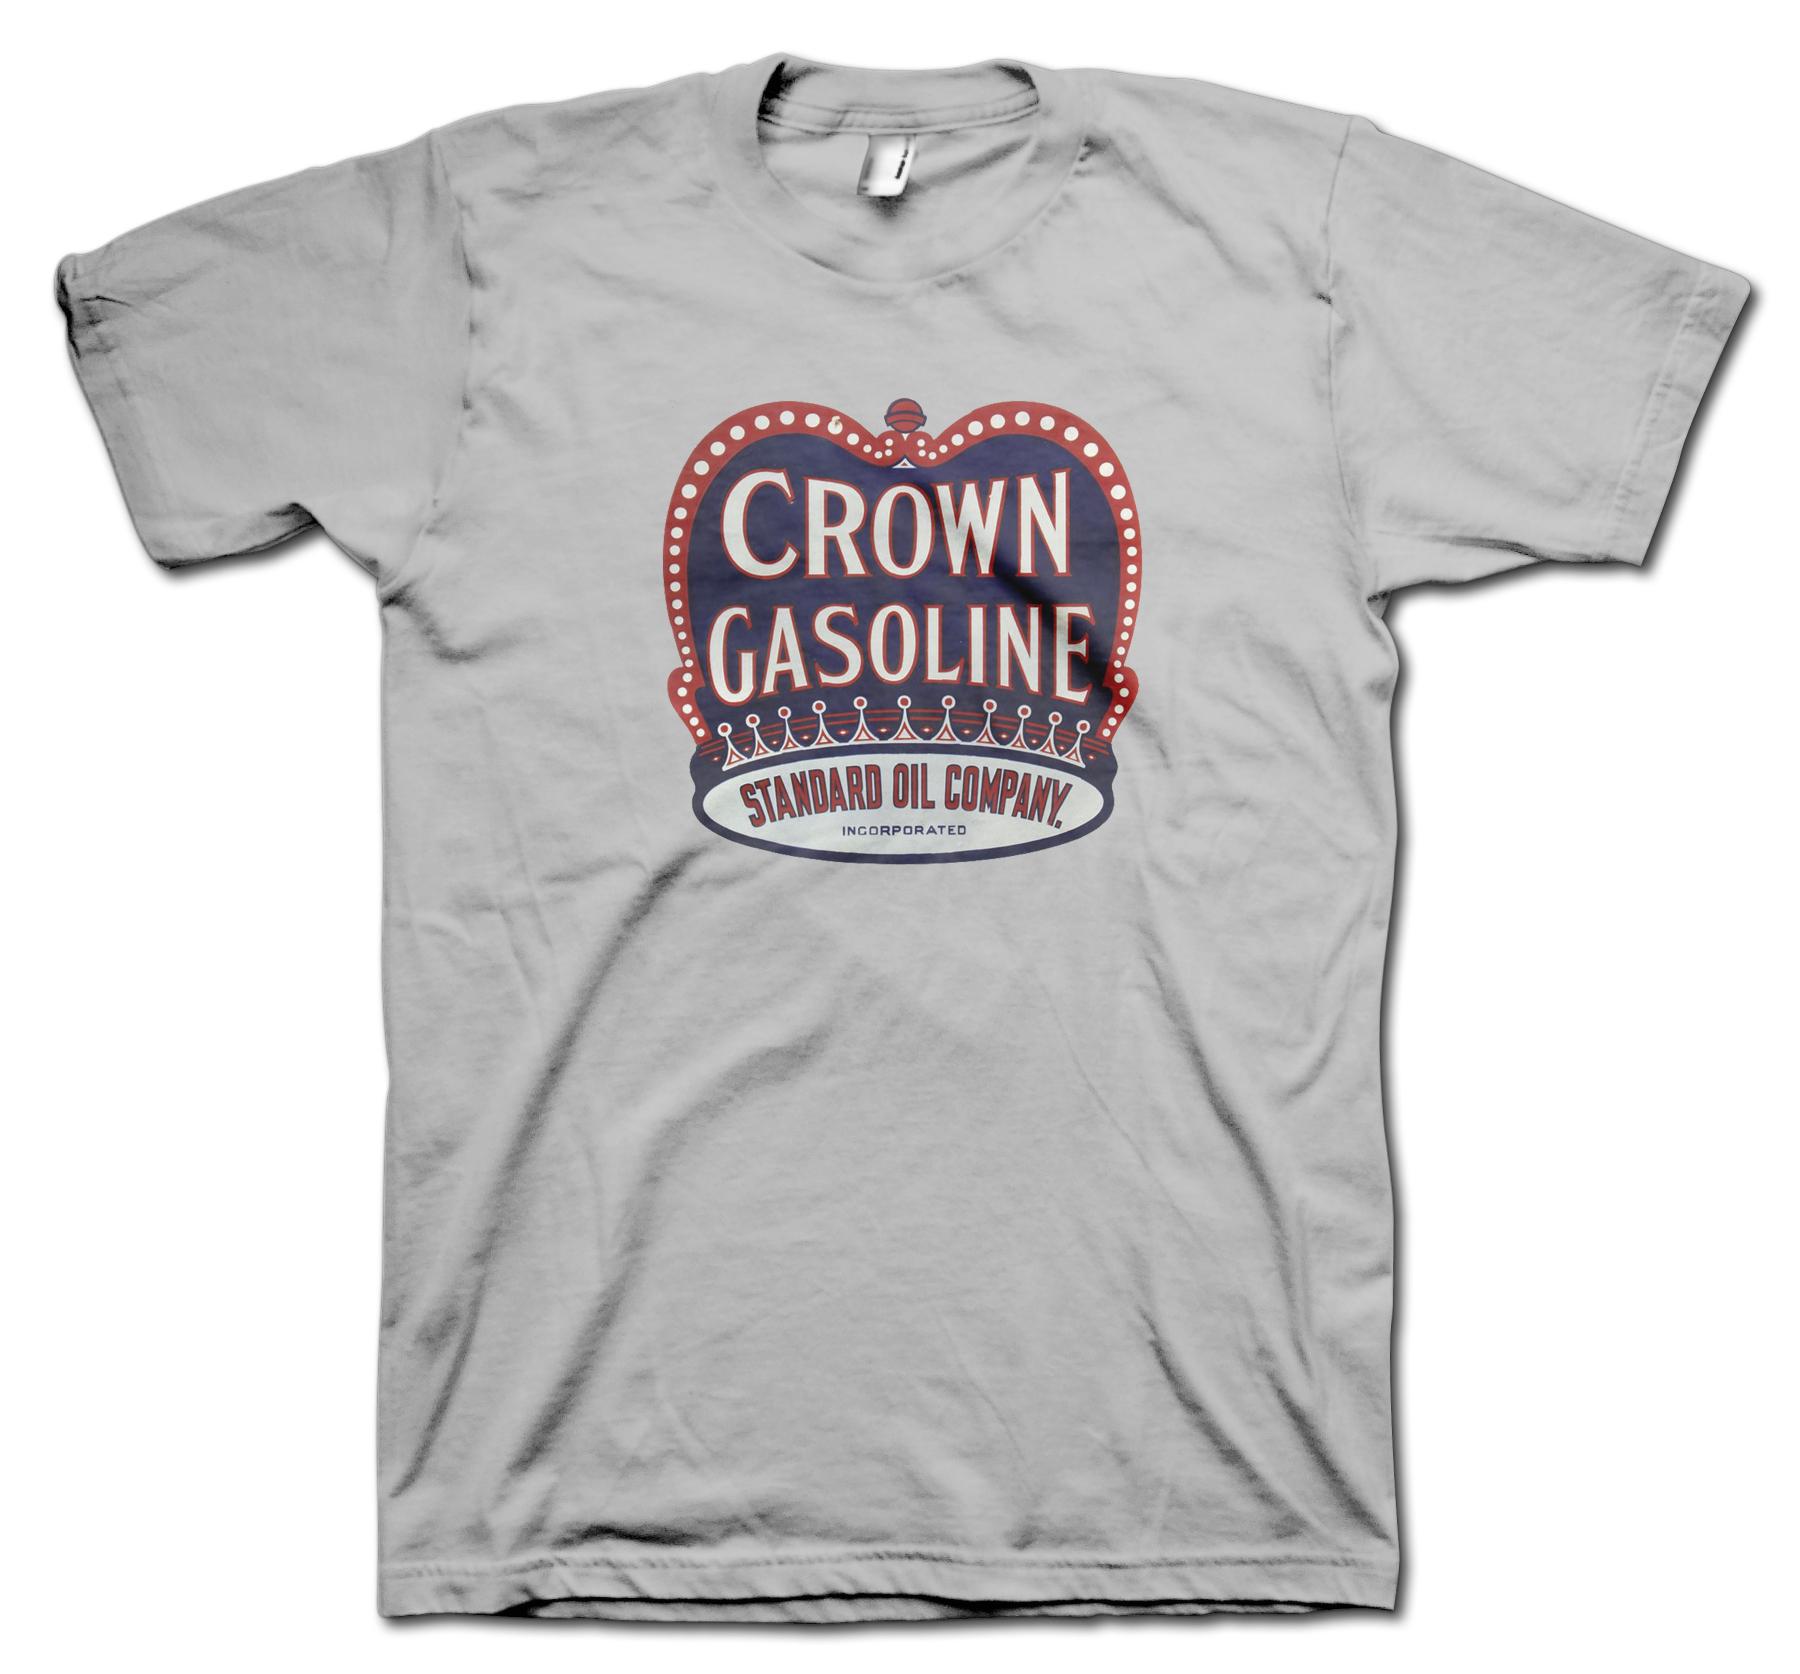 Crown gasoline retro t shirt for Vintage t shirt company